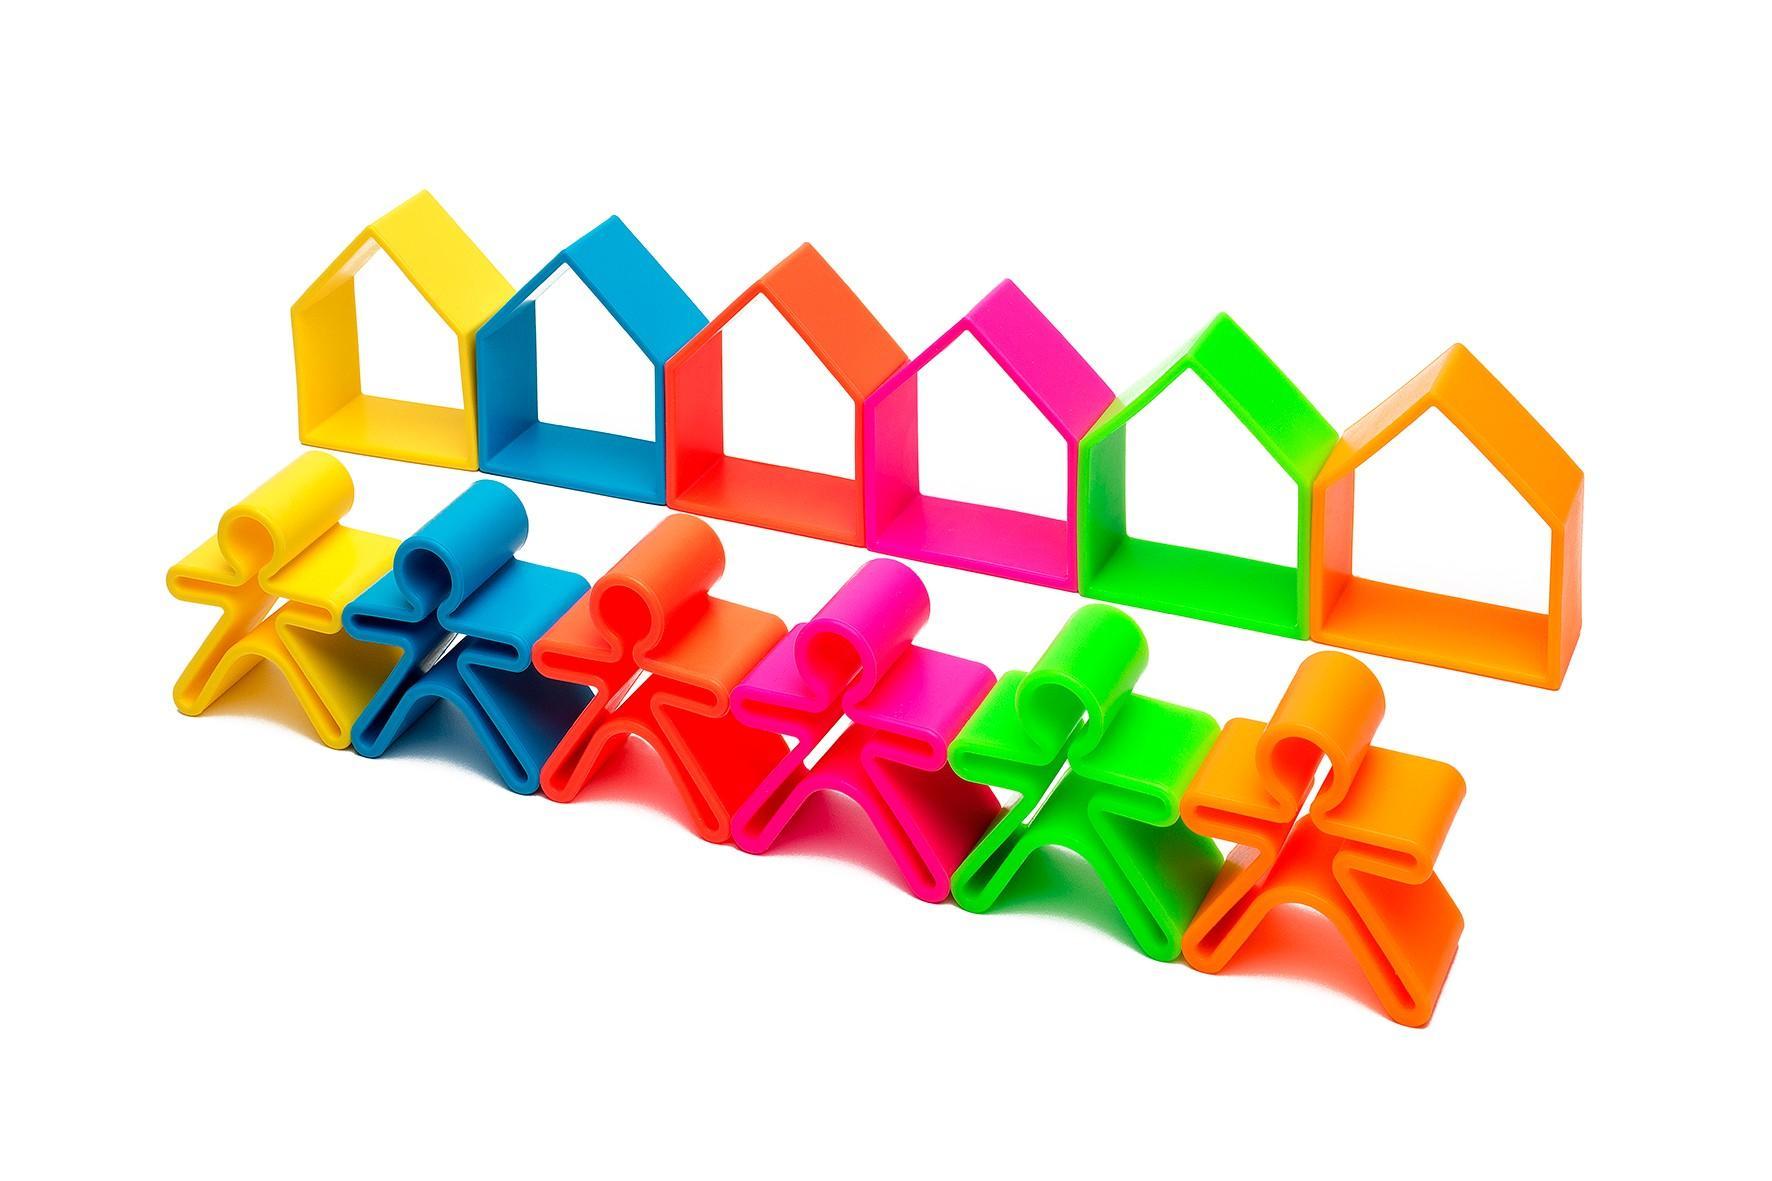 Dena - 6 Kids + 6 Houses Neon